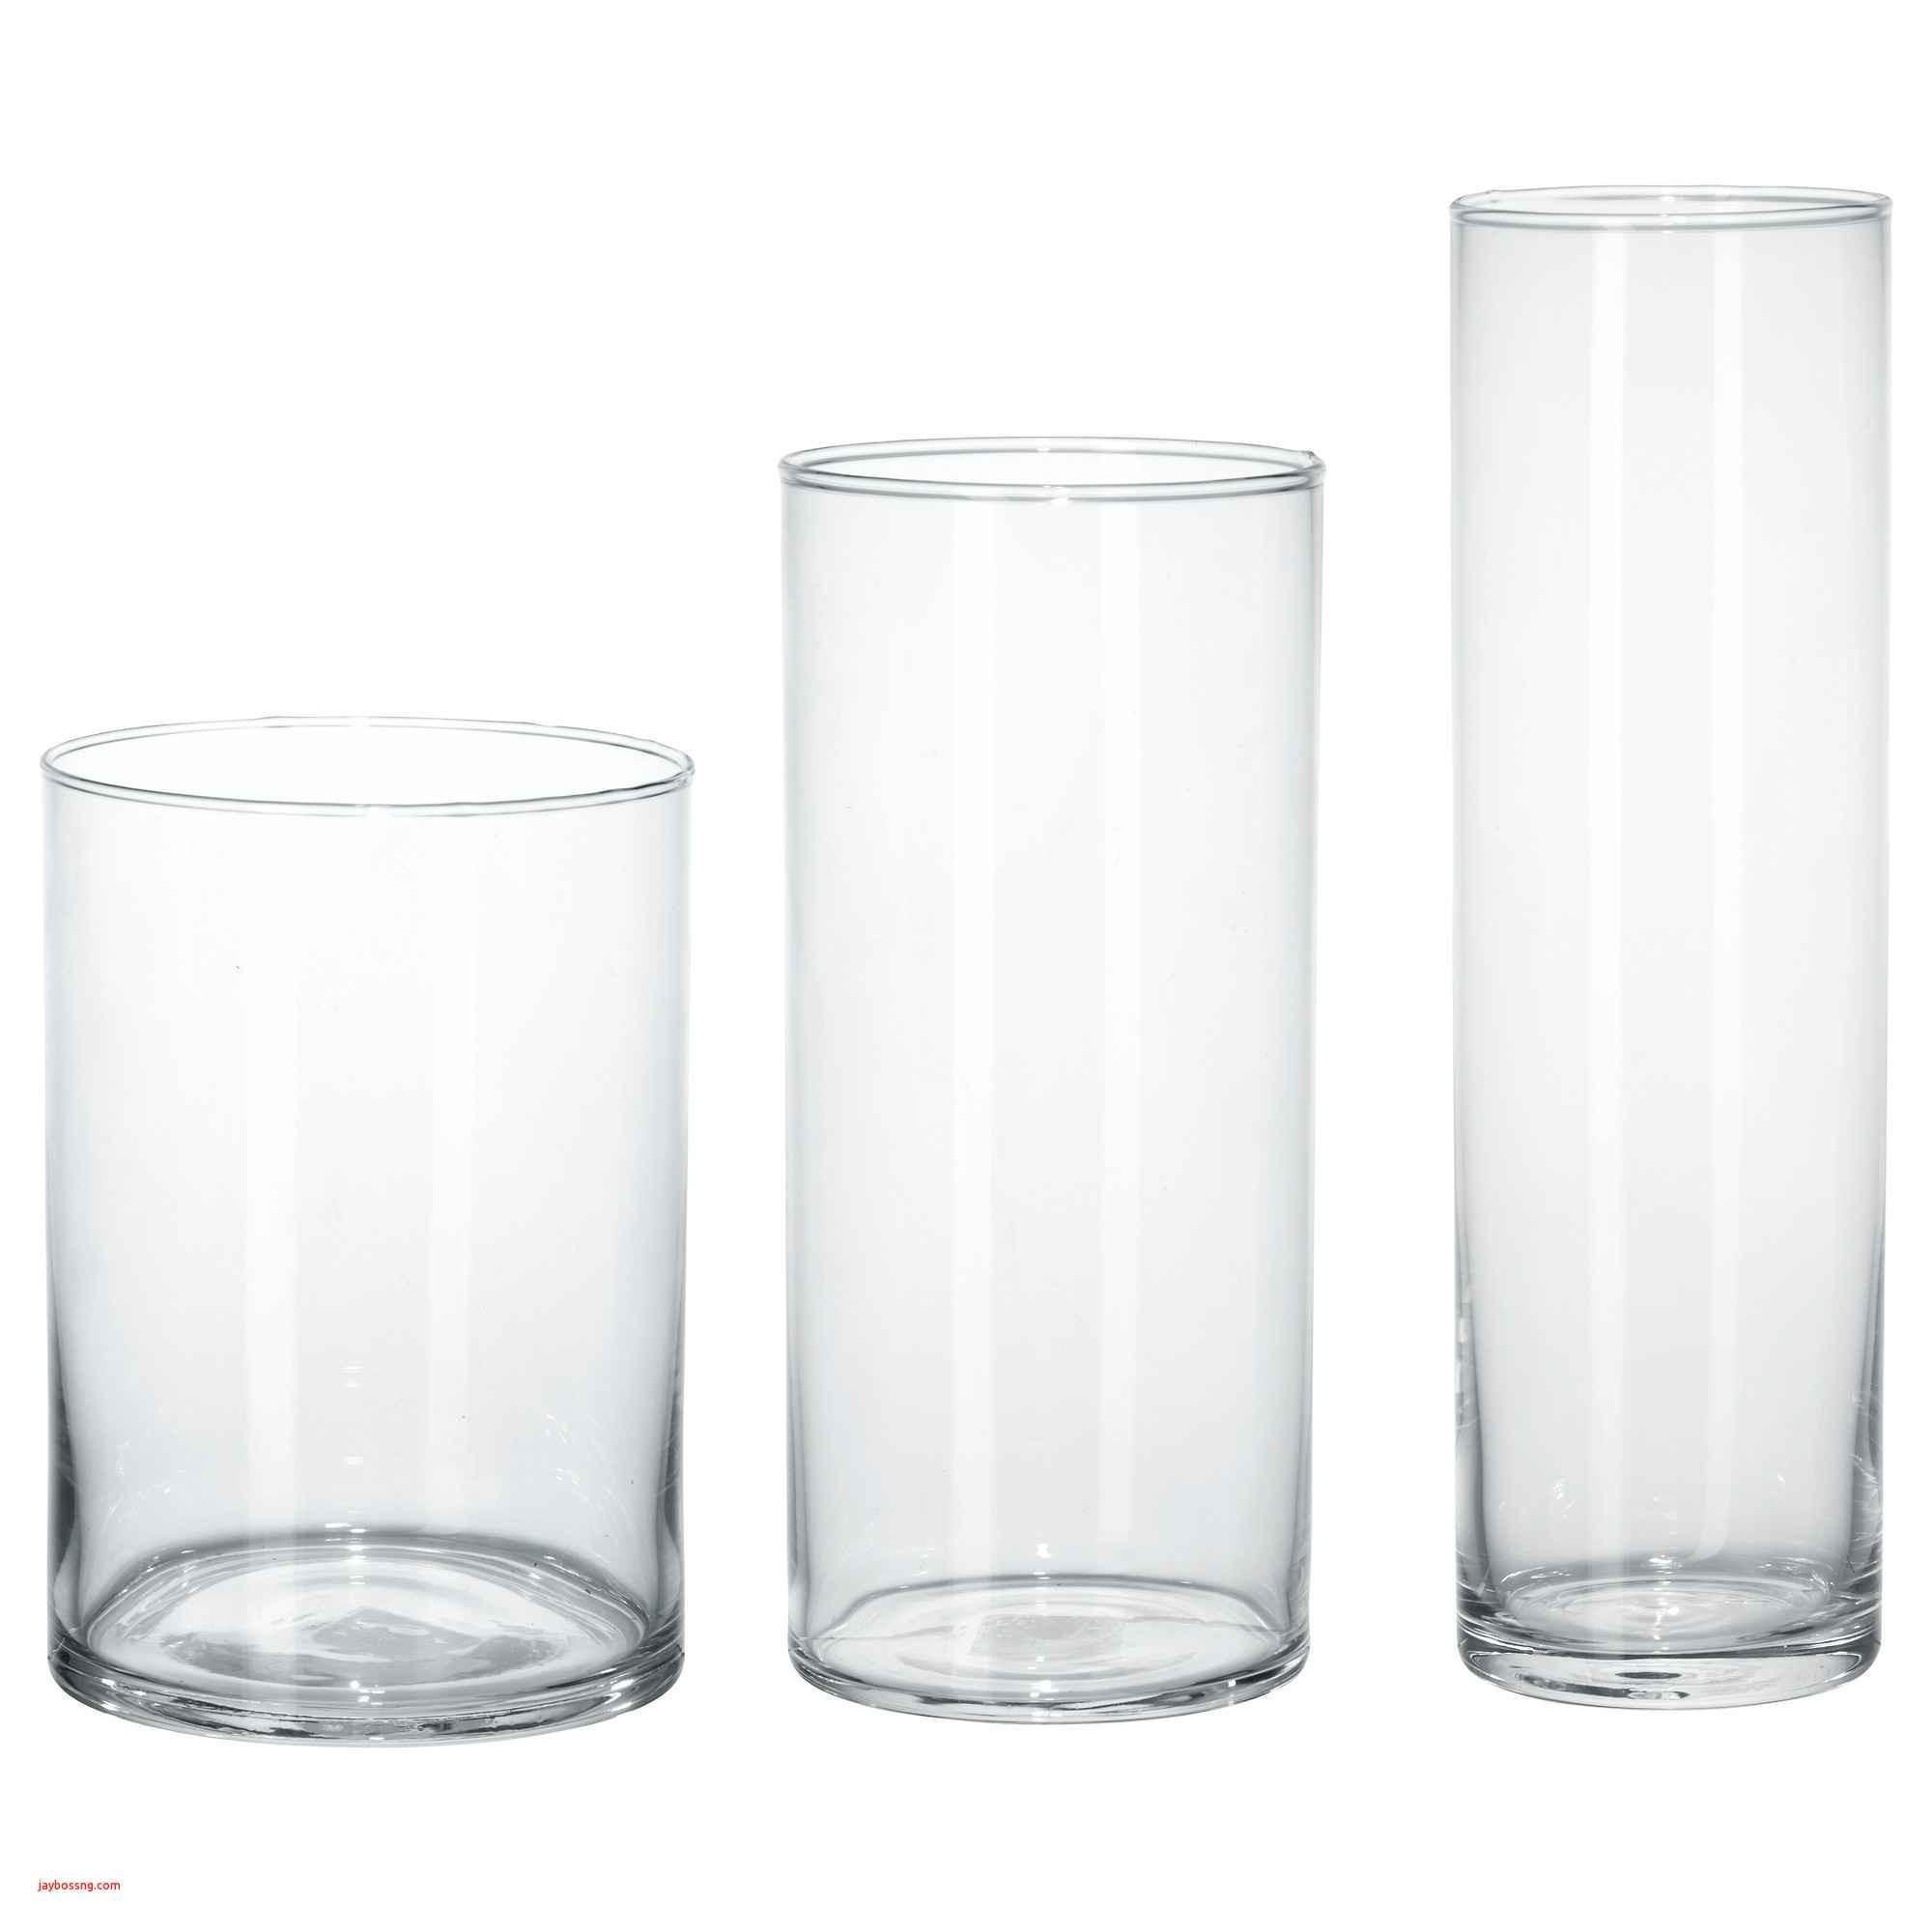 white ceramic pumpkin vase of white vase filler photos ikea white table created pe s5h vases ikea inside white vase filler photos ikea white table created pe s5h vases ikea vase i 0d bladet